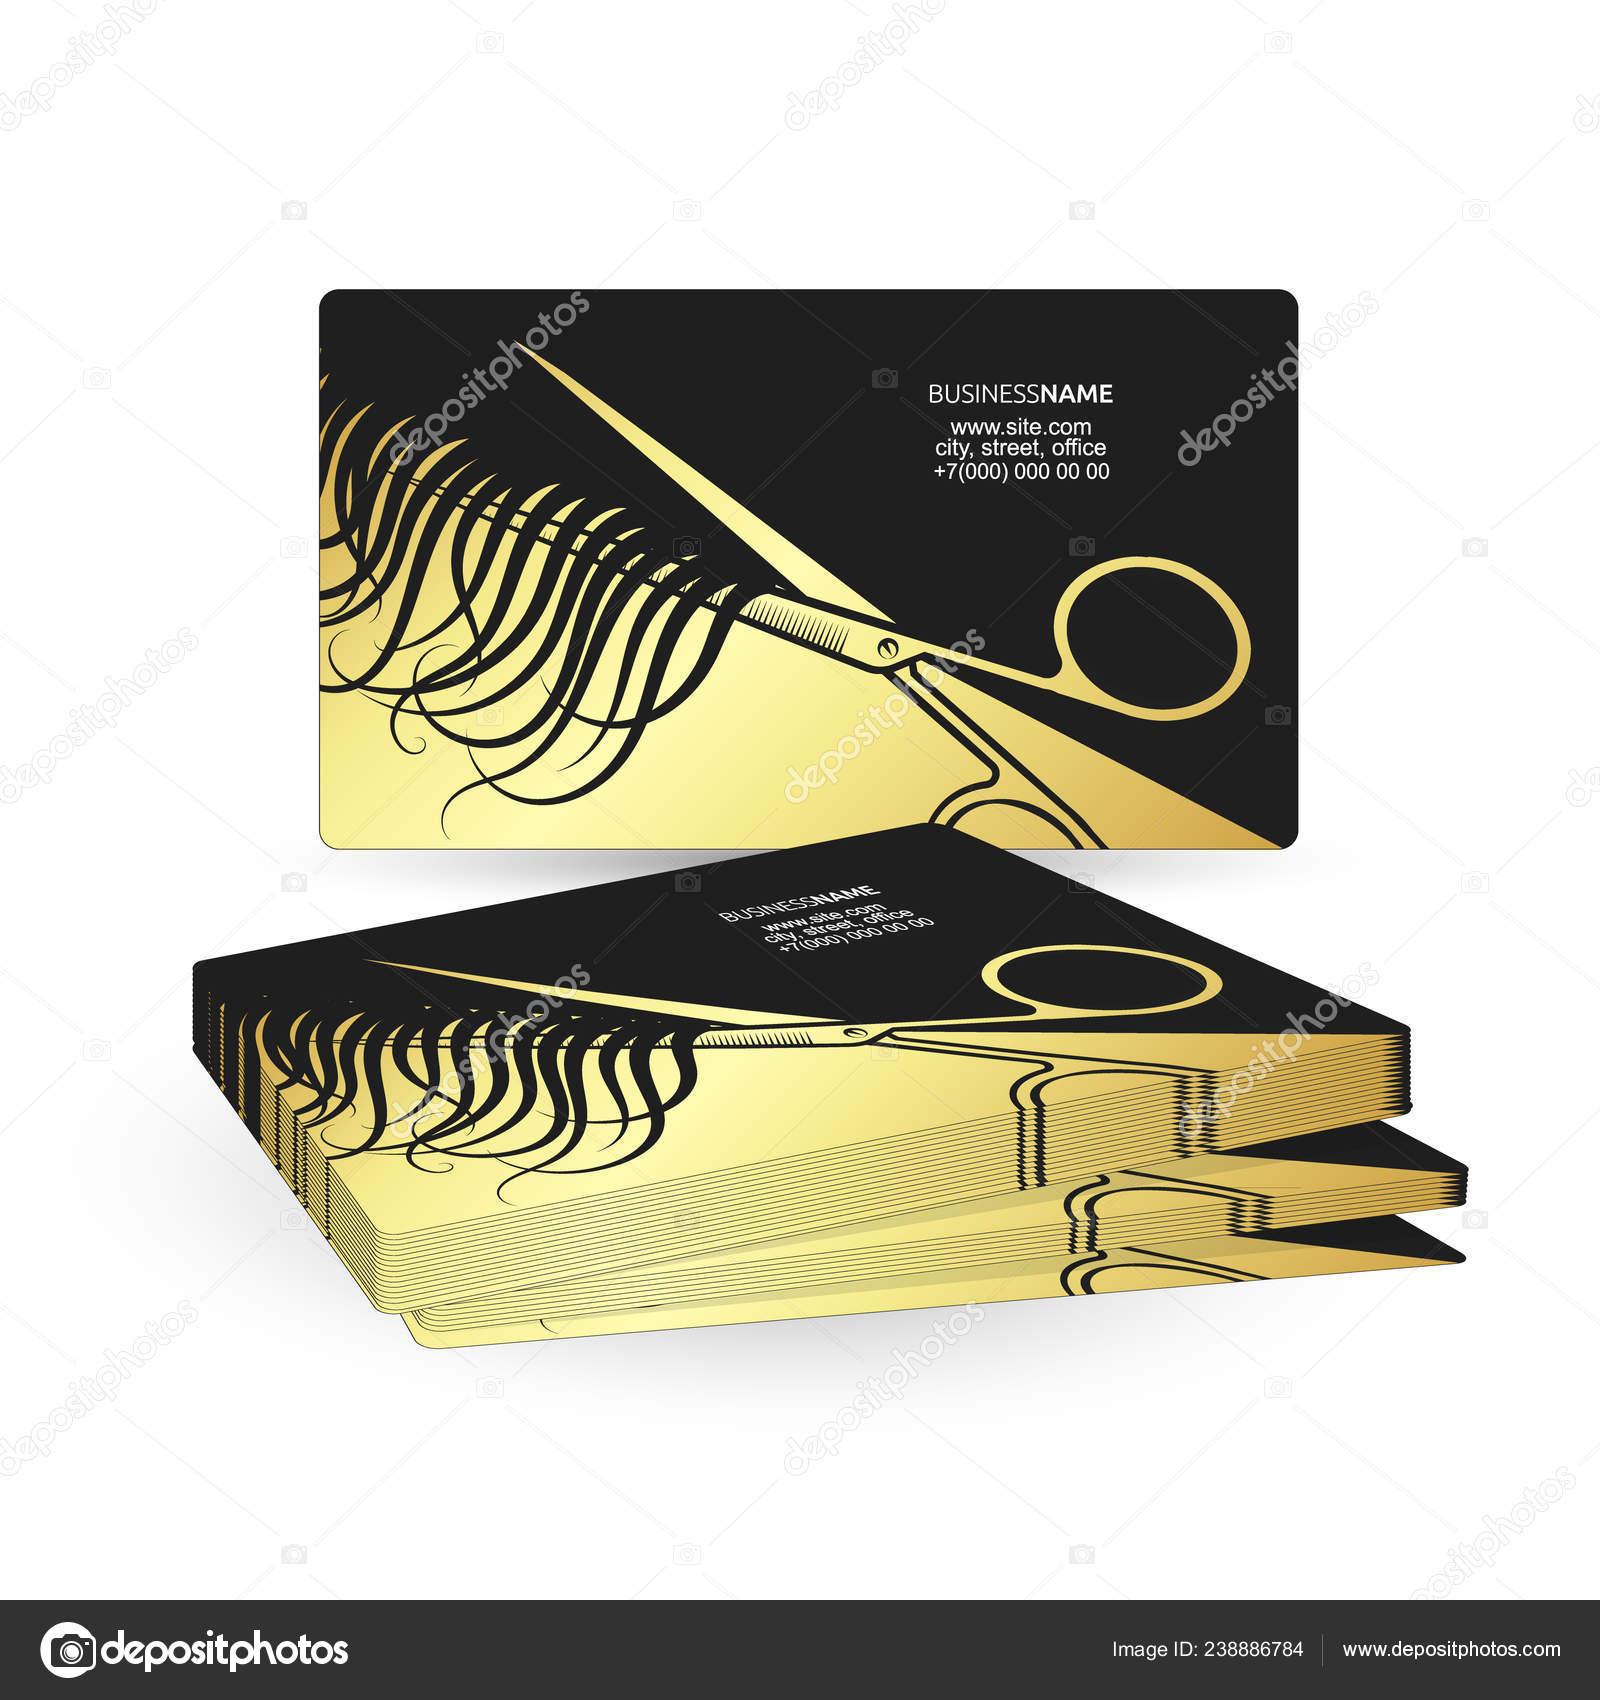 21 Business card for beauty and hair salon 30